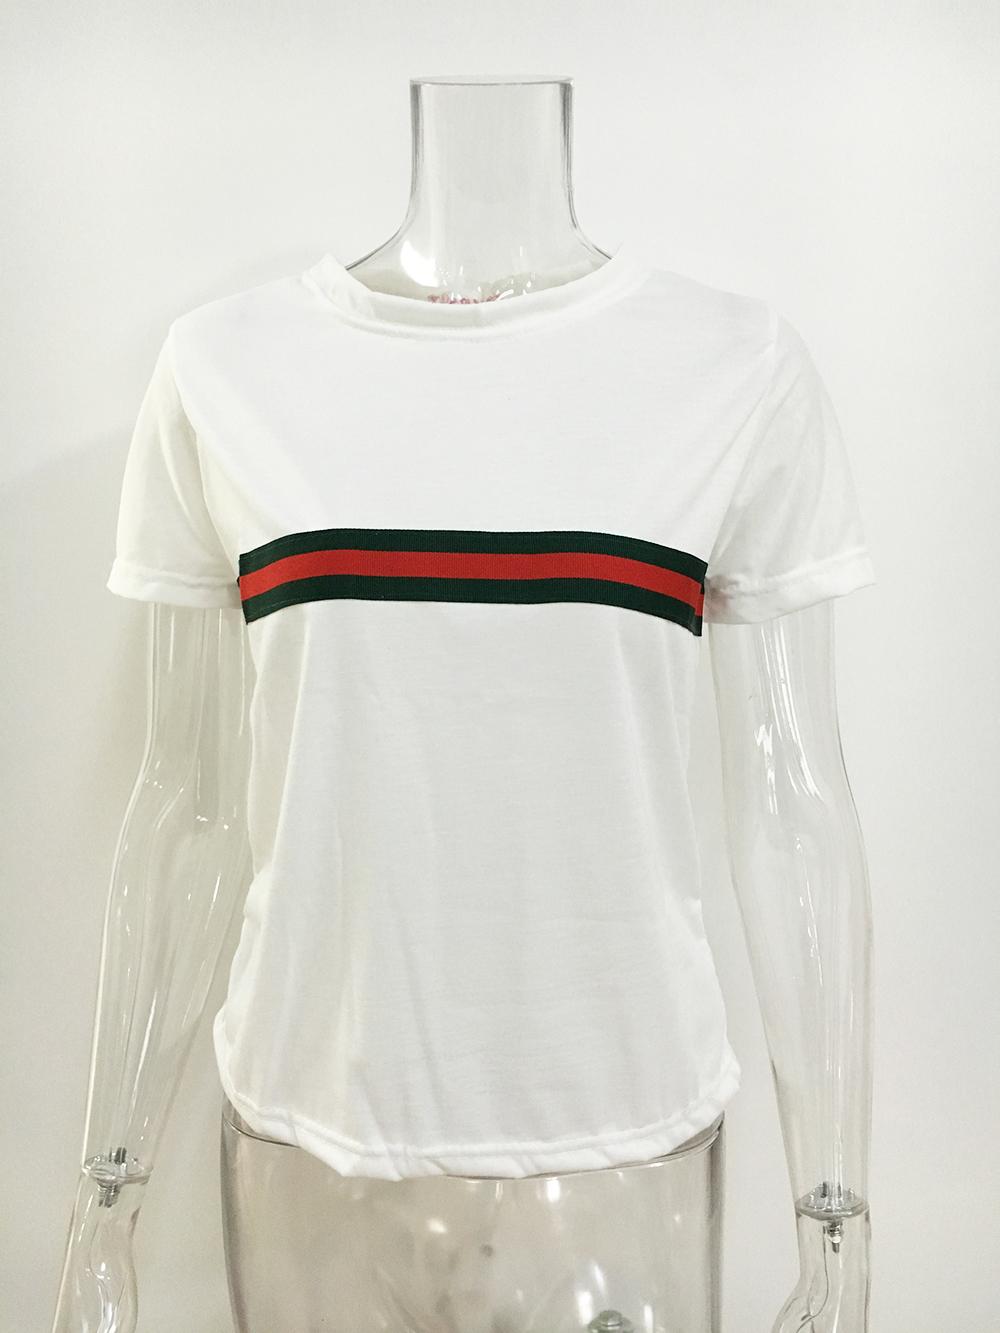 74741dbdc 1980 Cropped Tee T-shirt with Gucci Stripe Print · Ohya Fashion ...